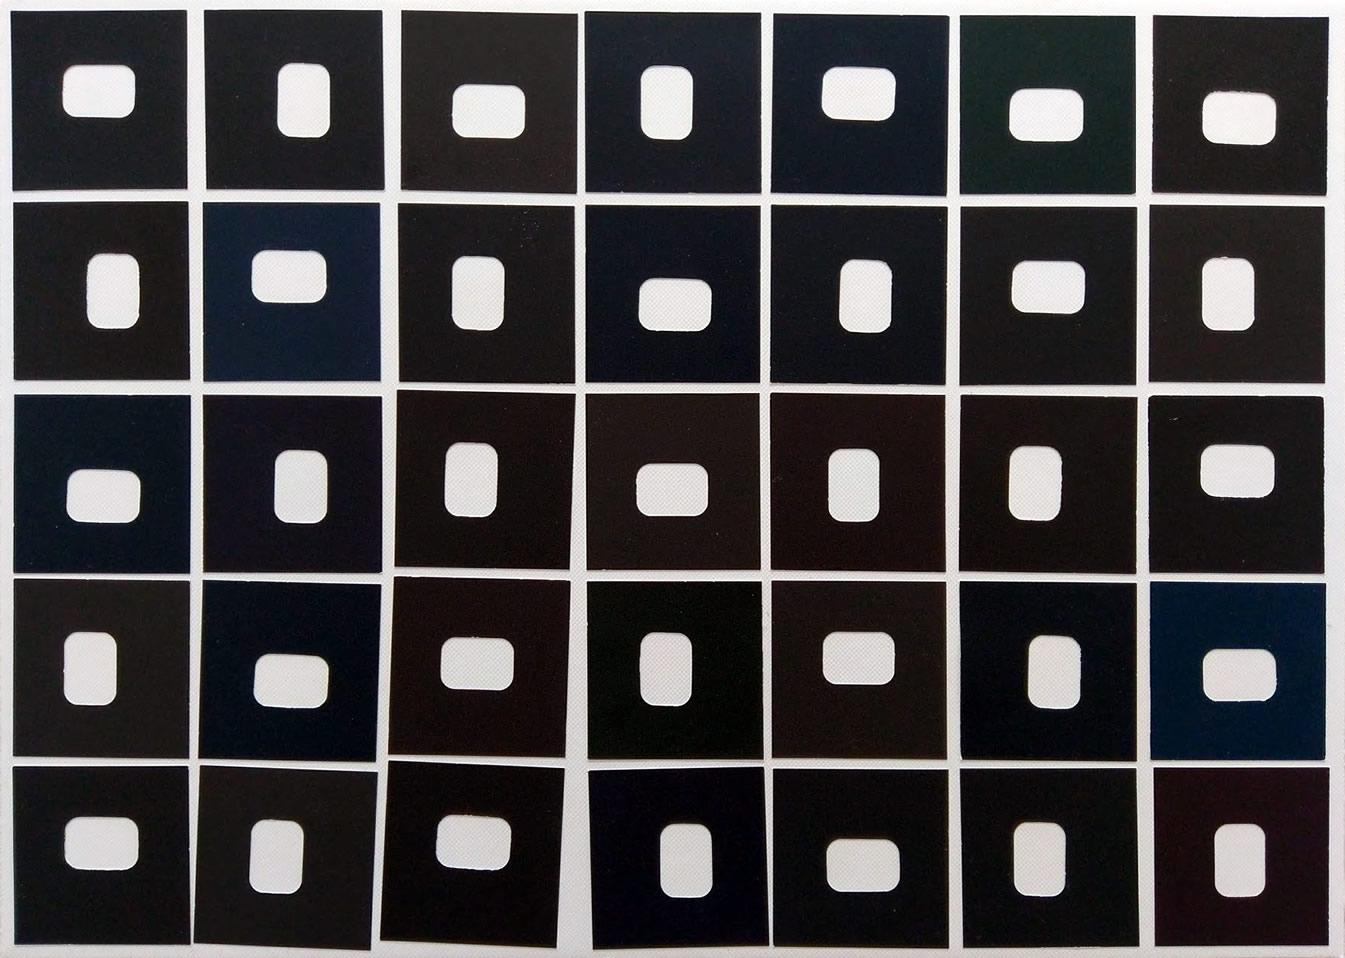 Minimalist collage by David sMith